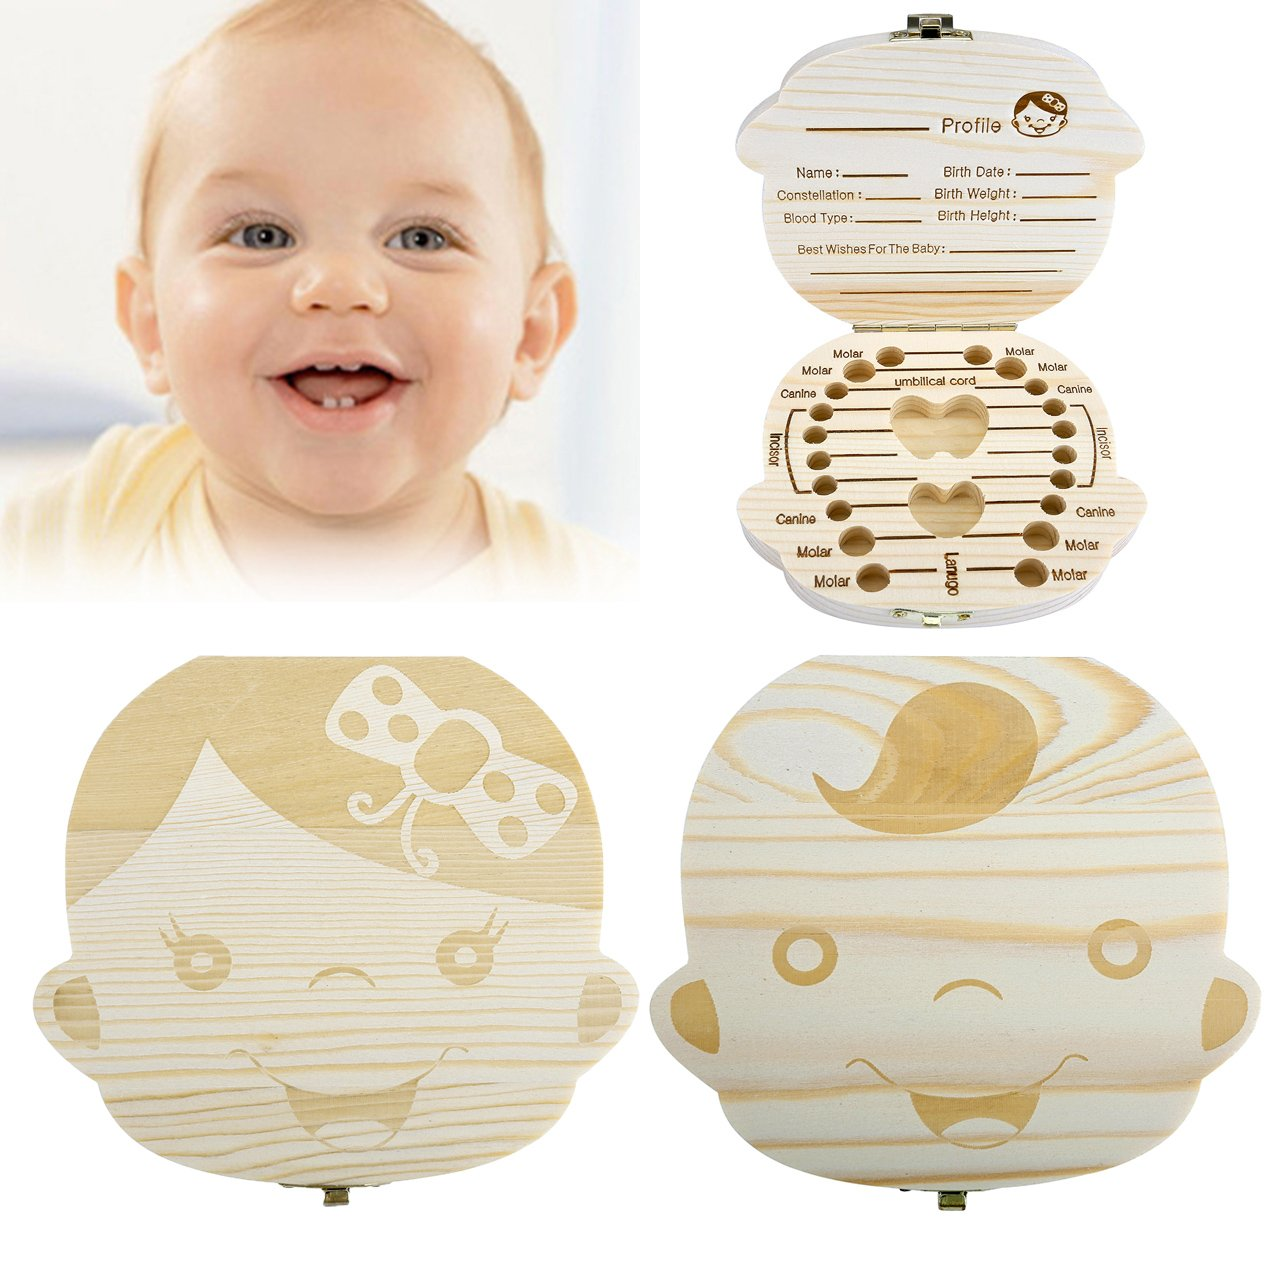 Baby Teeth Box, Yoption Child Milk Teeth Save Wooden Keepsake Souvenir Box, Customize Personalized Baby Tooth Box for Kids Boy&Girl (English, Girl)